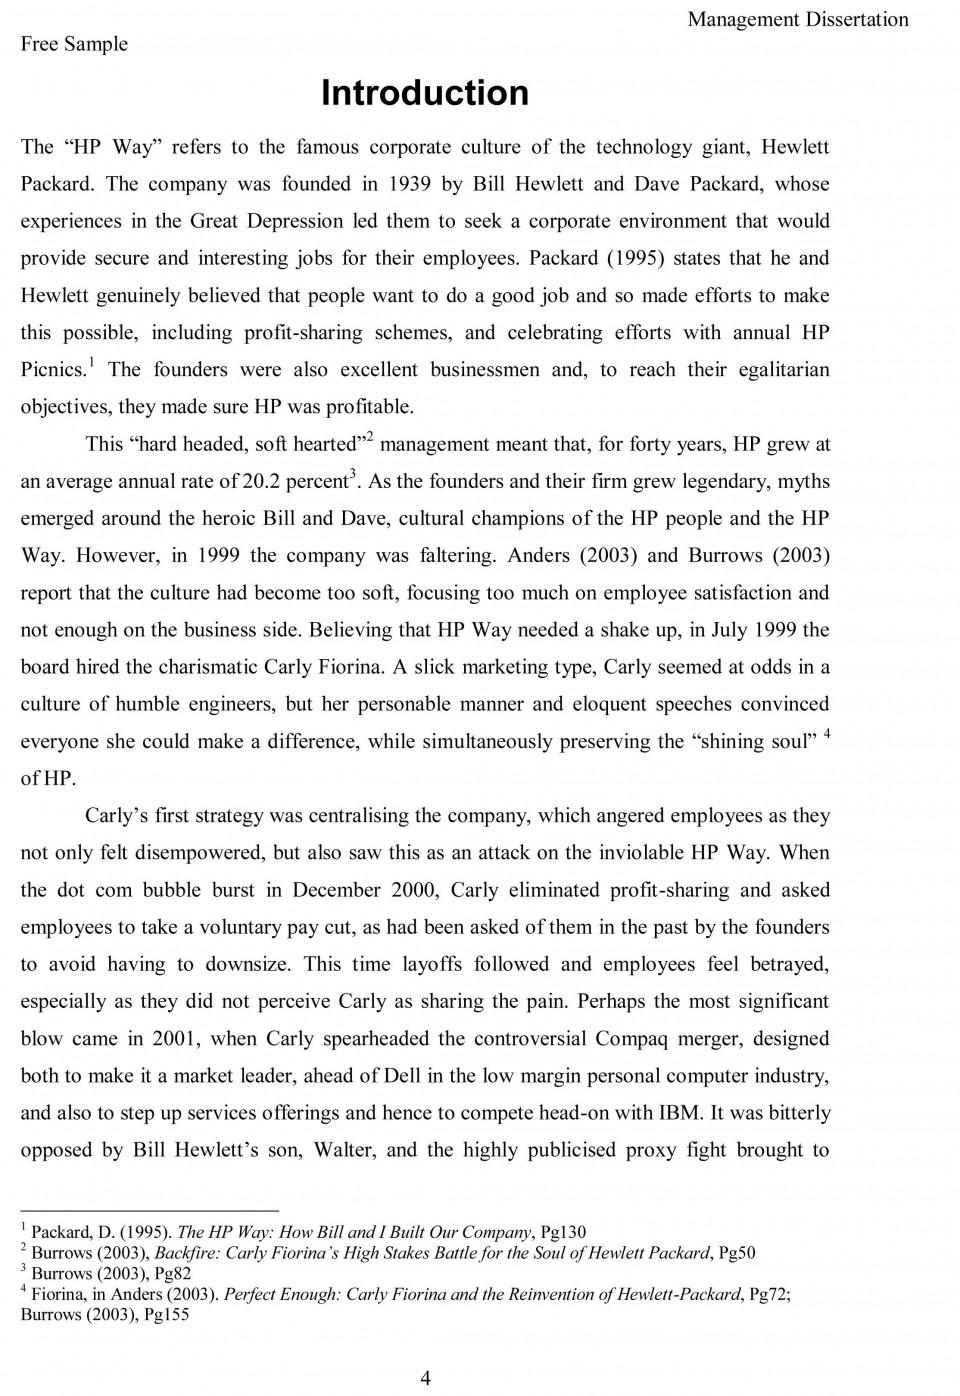 008 Unusual Essay Paper High Resolution  Upsc 2019 In Hindi Pdf Format Cs Past 2018960